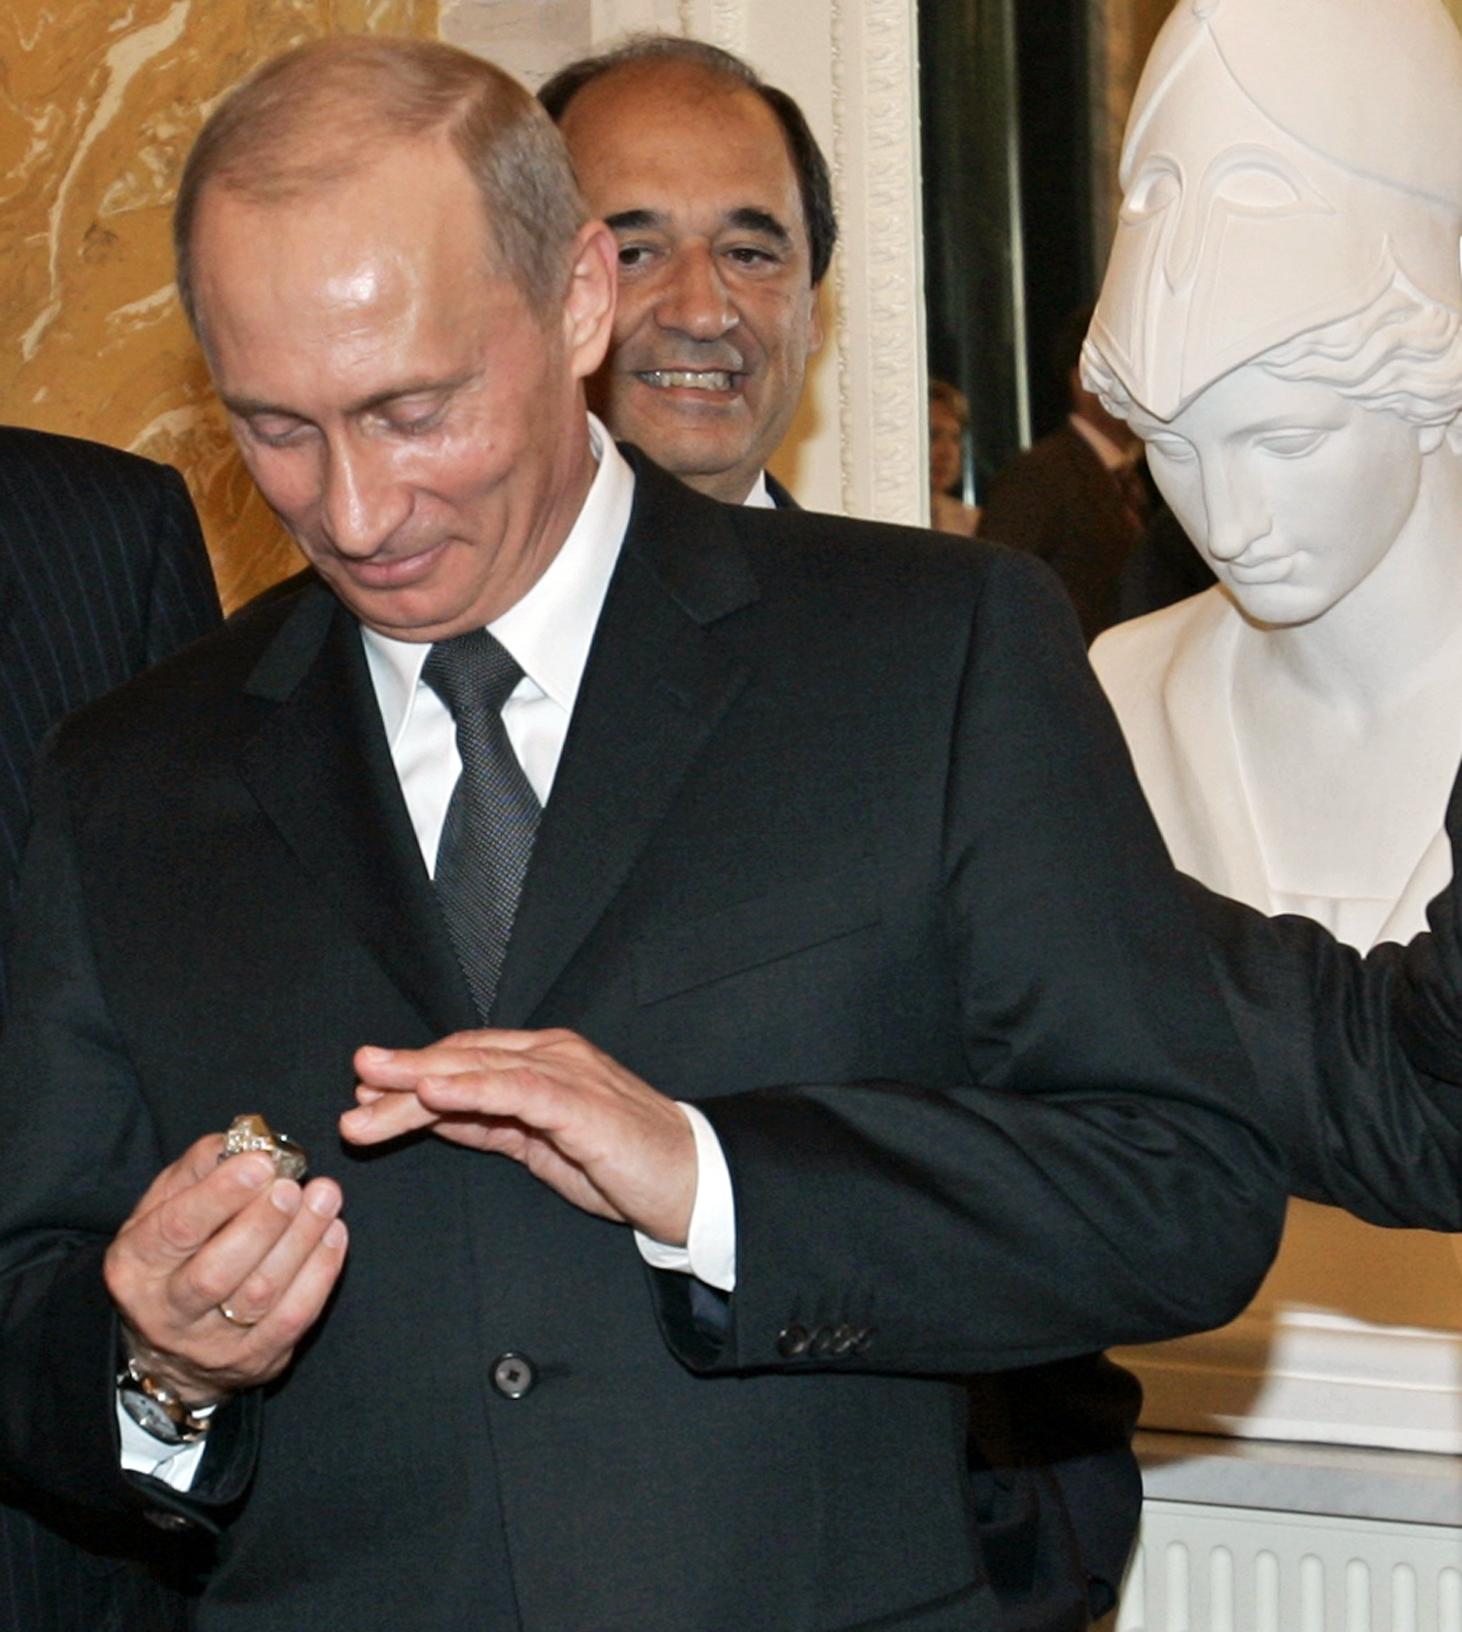 Putin Super Bowl Ring Football